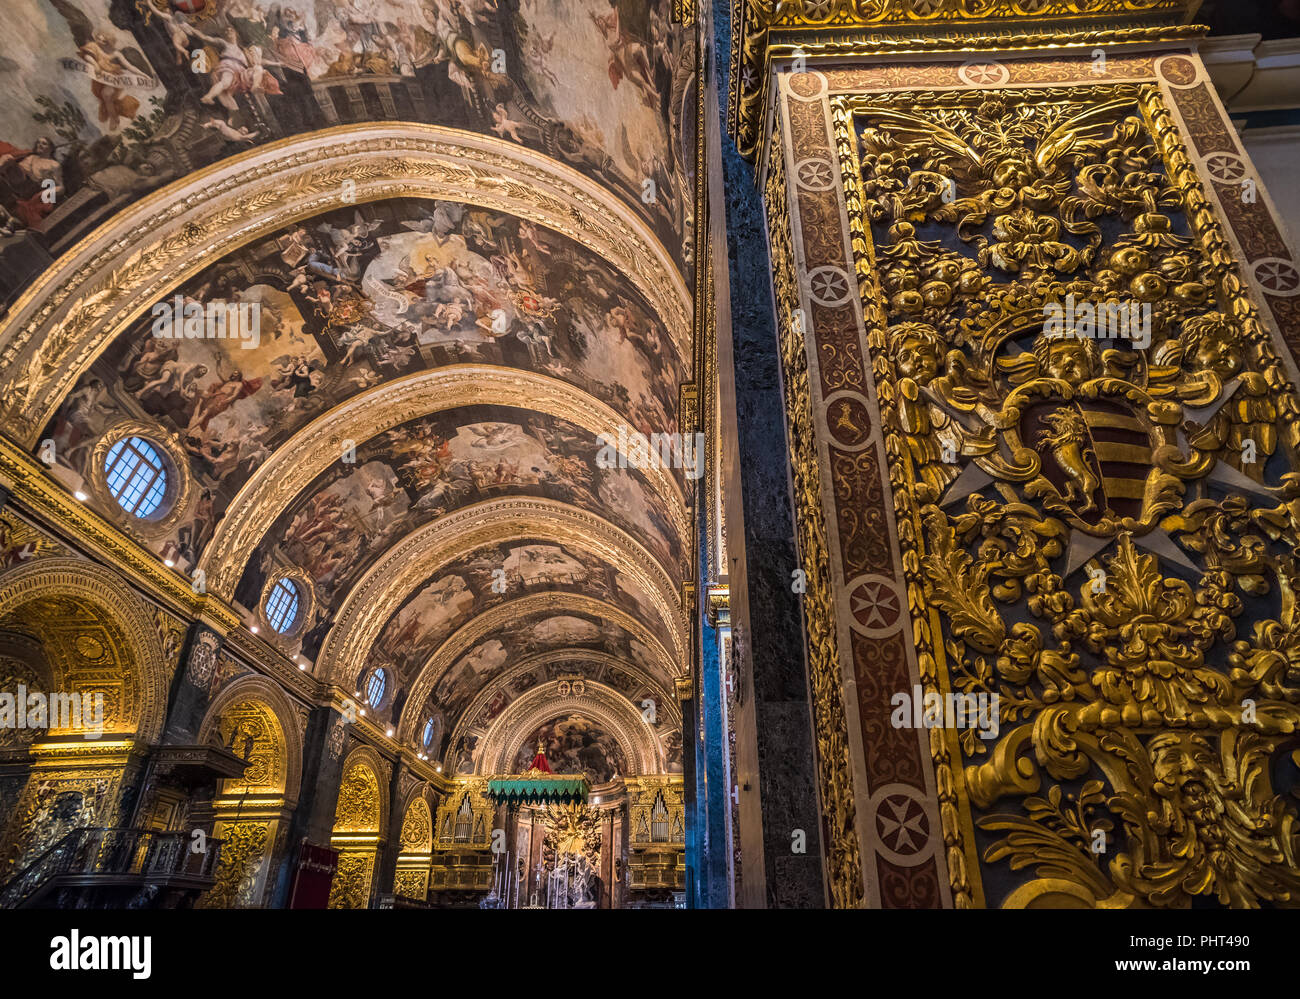 Interior of St John's Co-Cathedral, Valletta, Malta - Stock Image